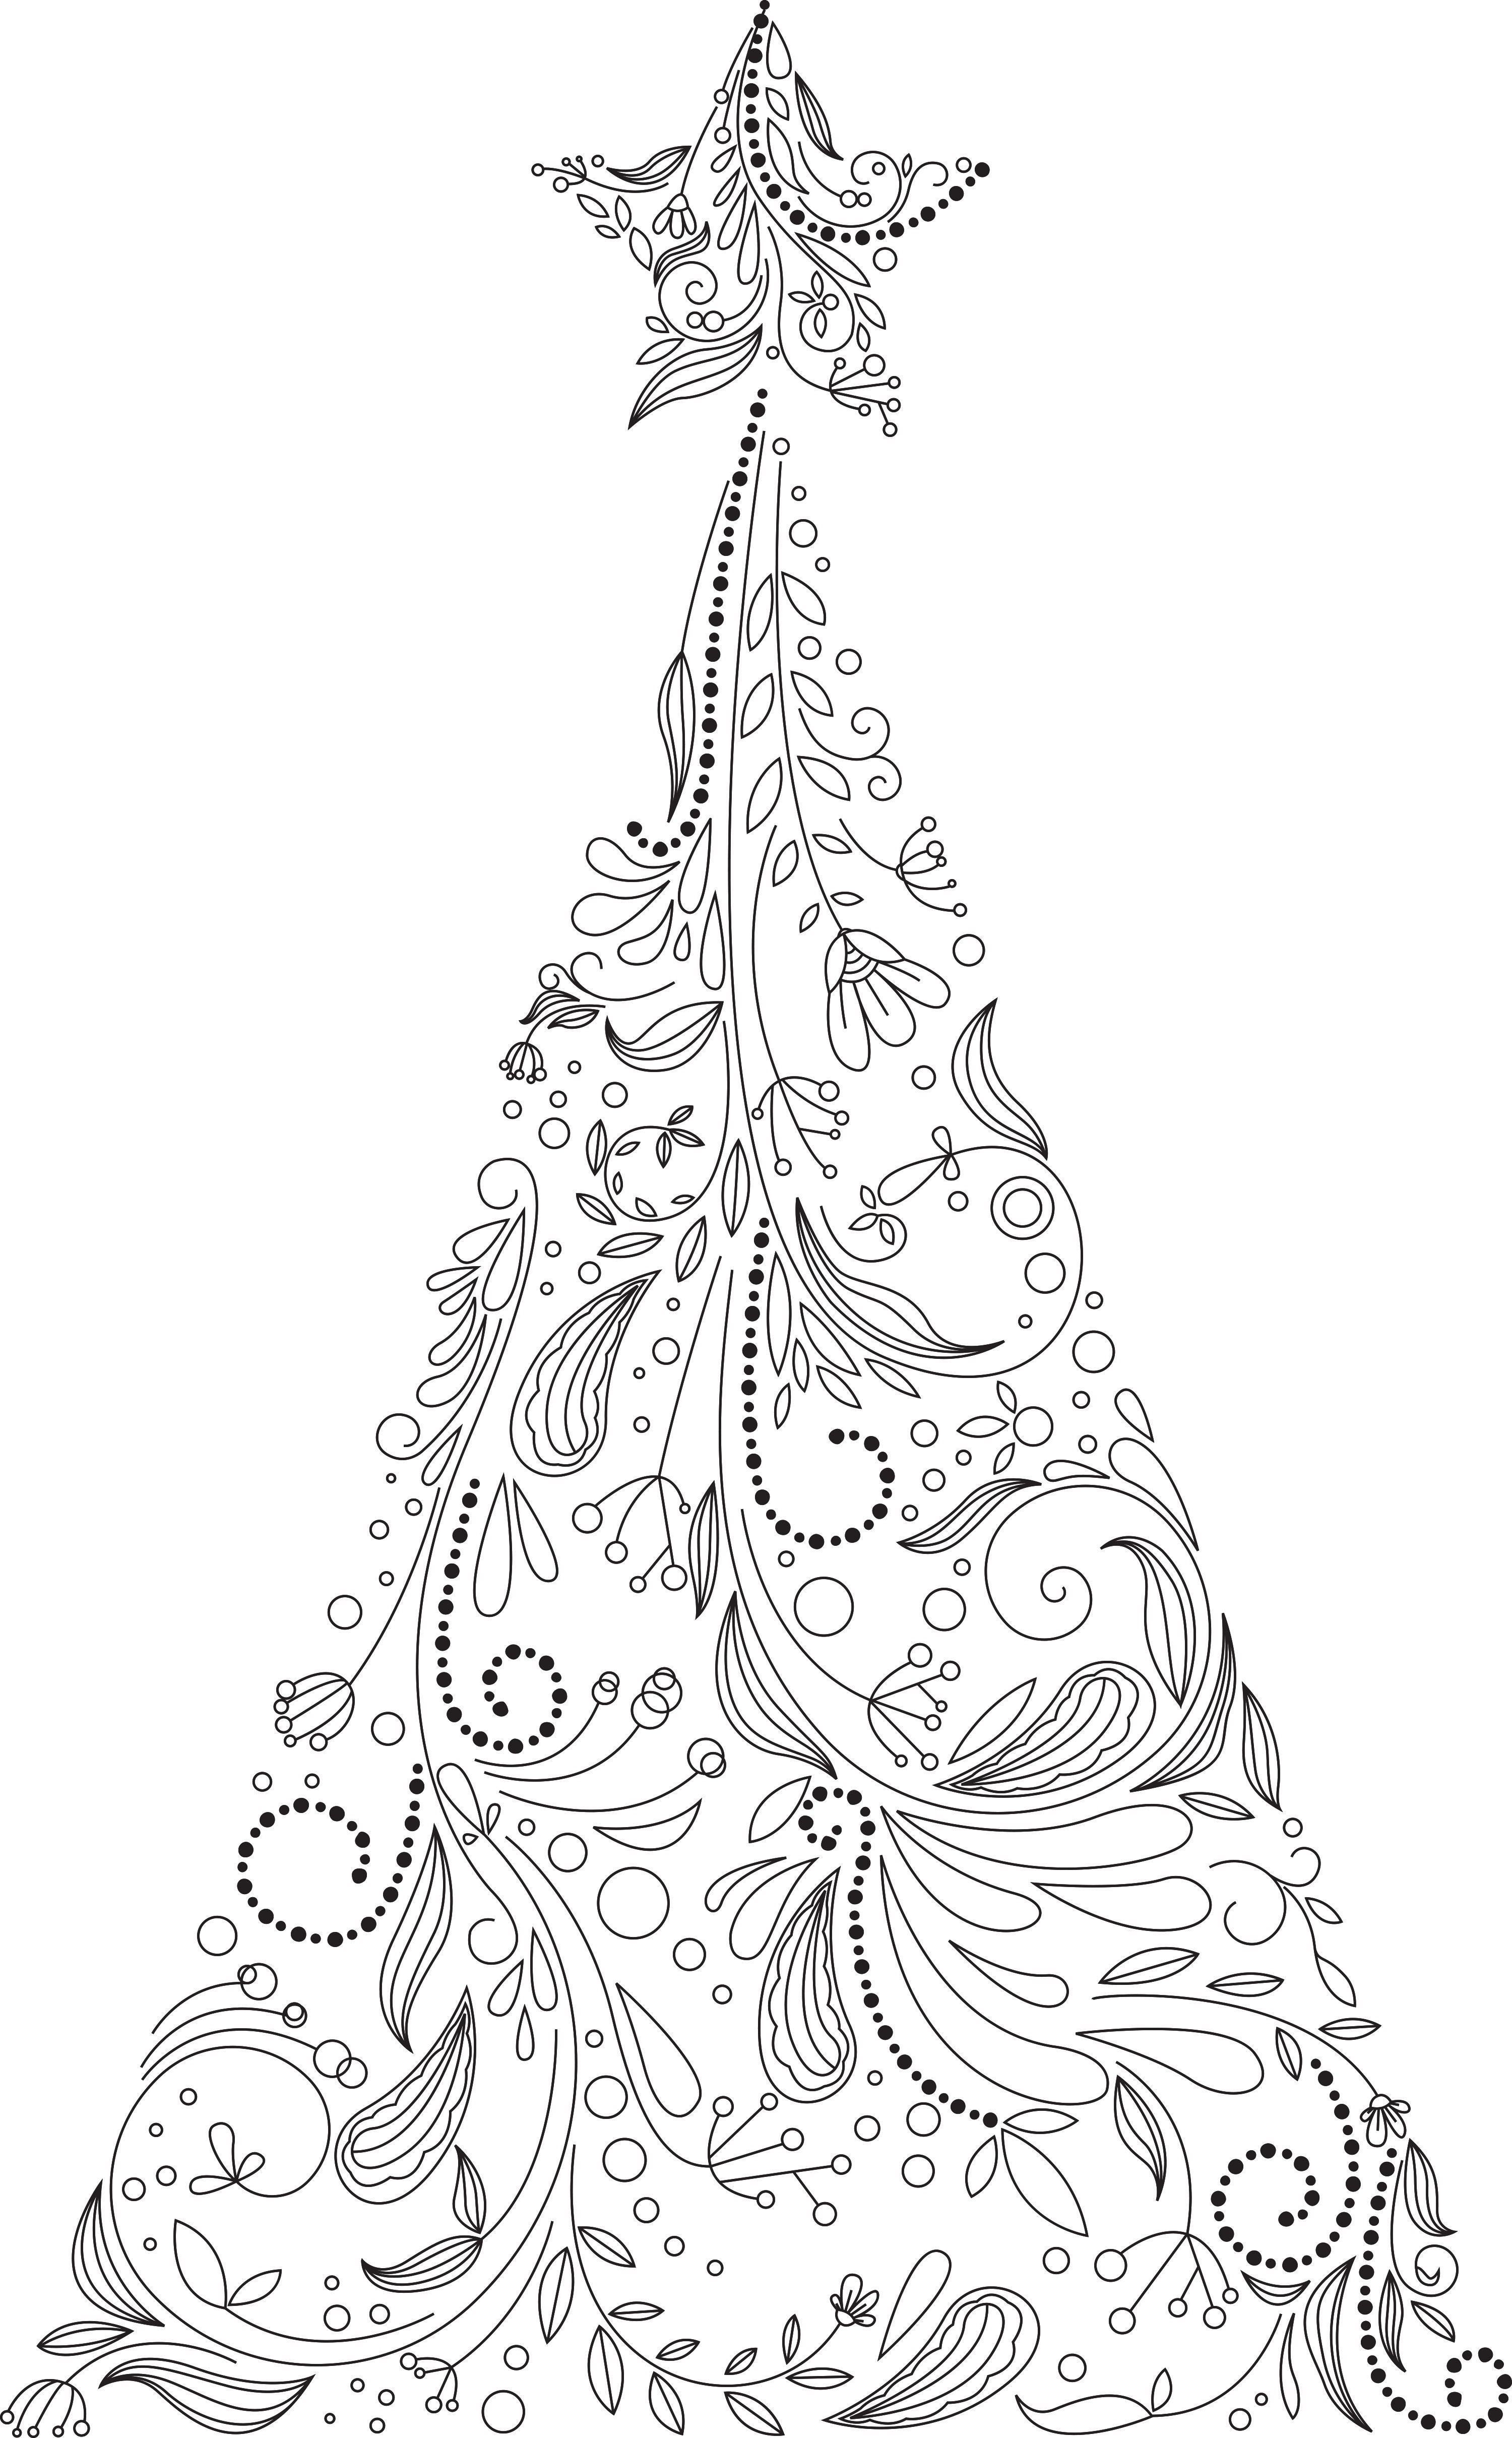 Christmas Coloring06 Okosodjvelunk Sz Nez K Coloring Pinterest